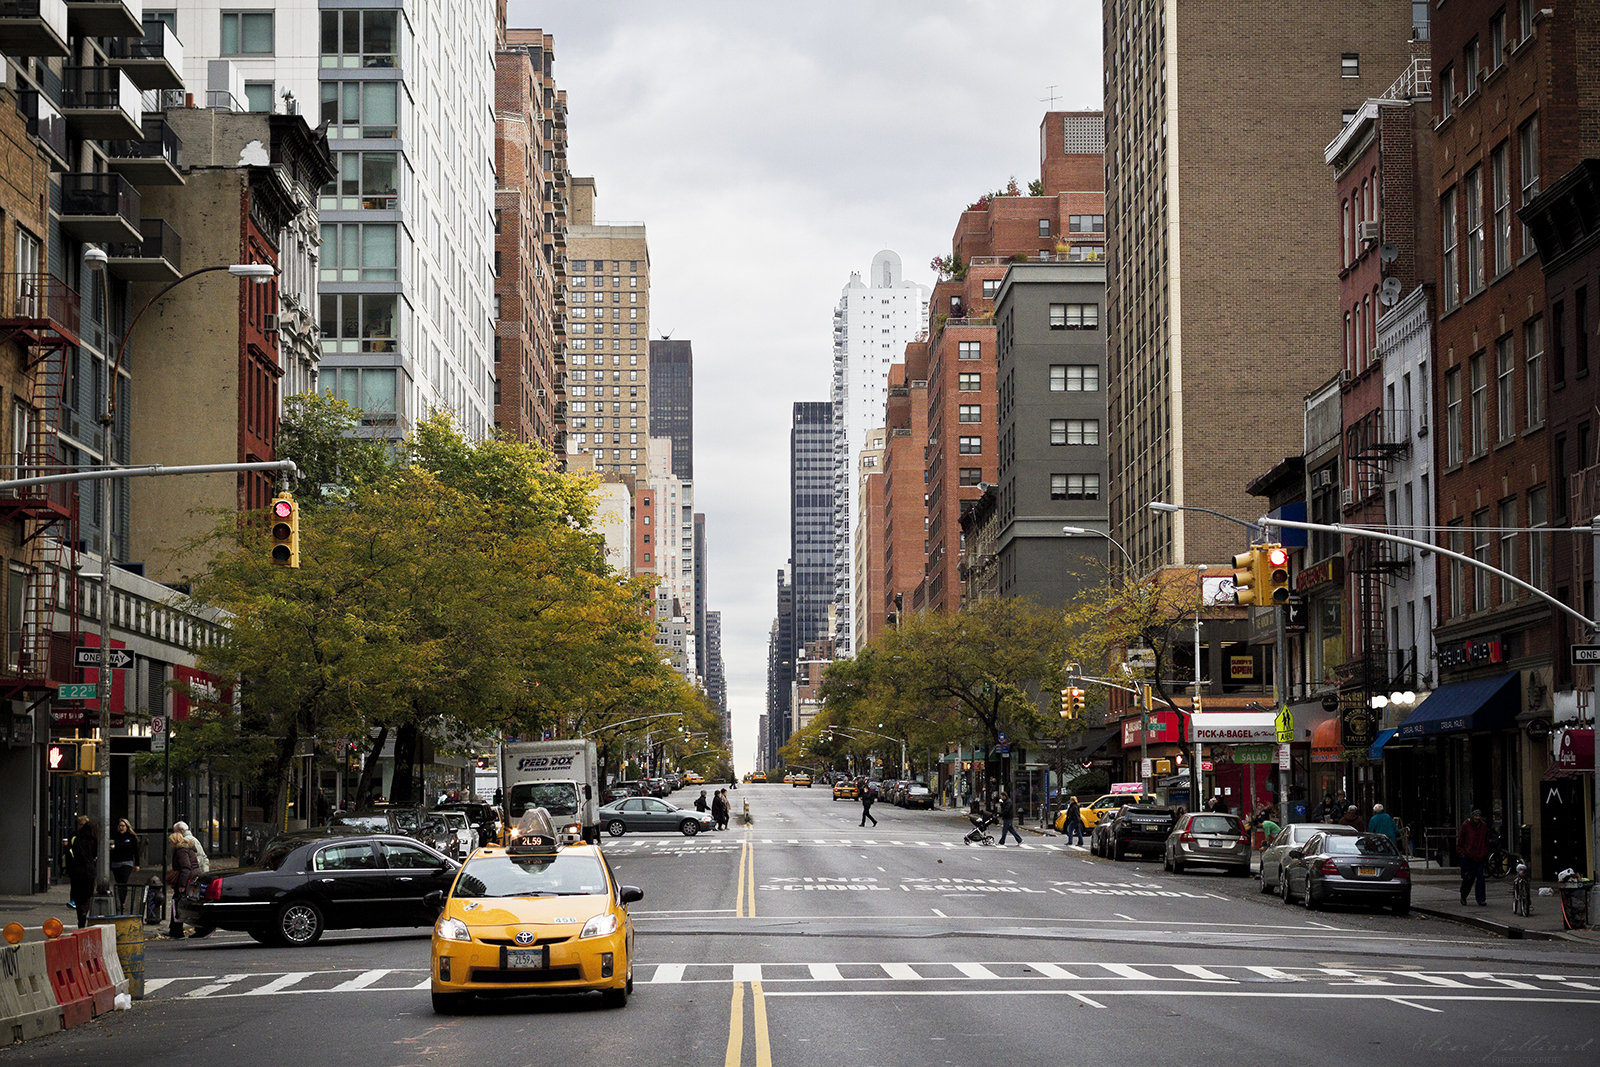 elise-julliard-photographe-new-york-etats-unis-usa-street